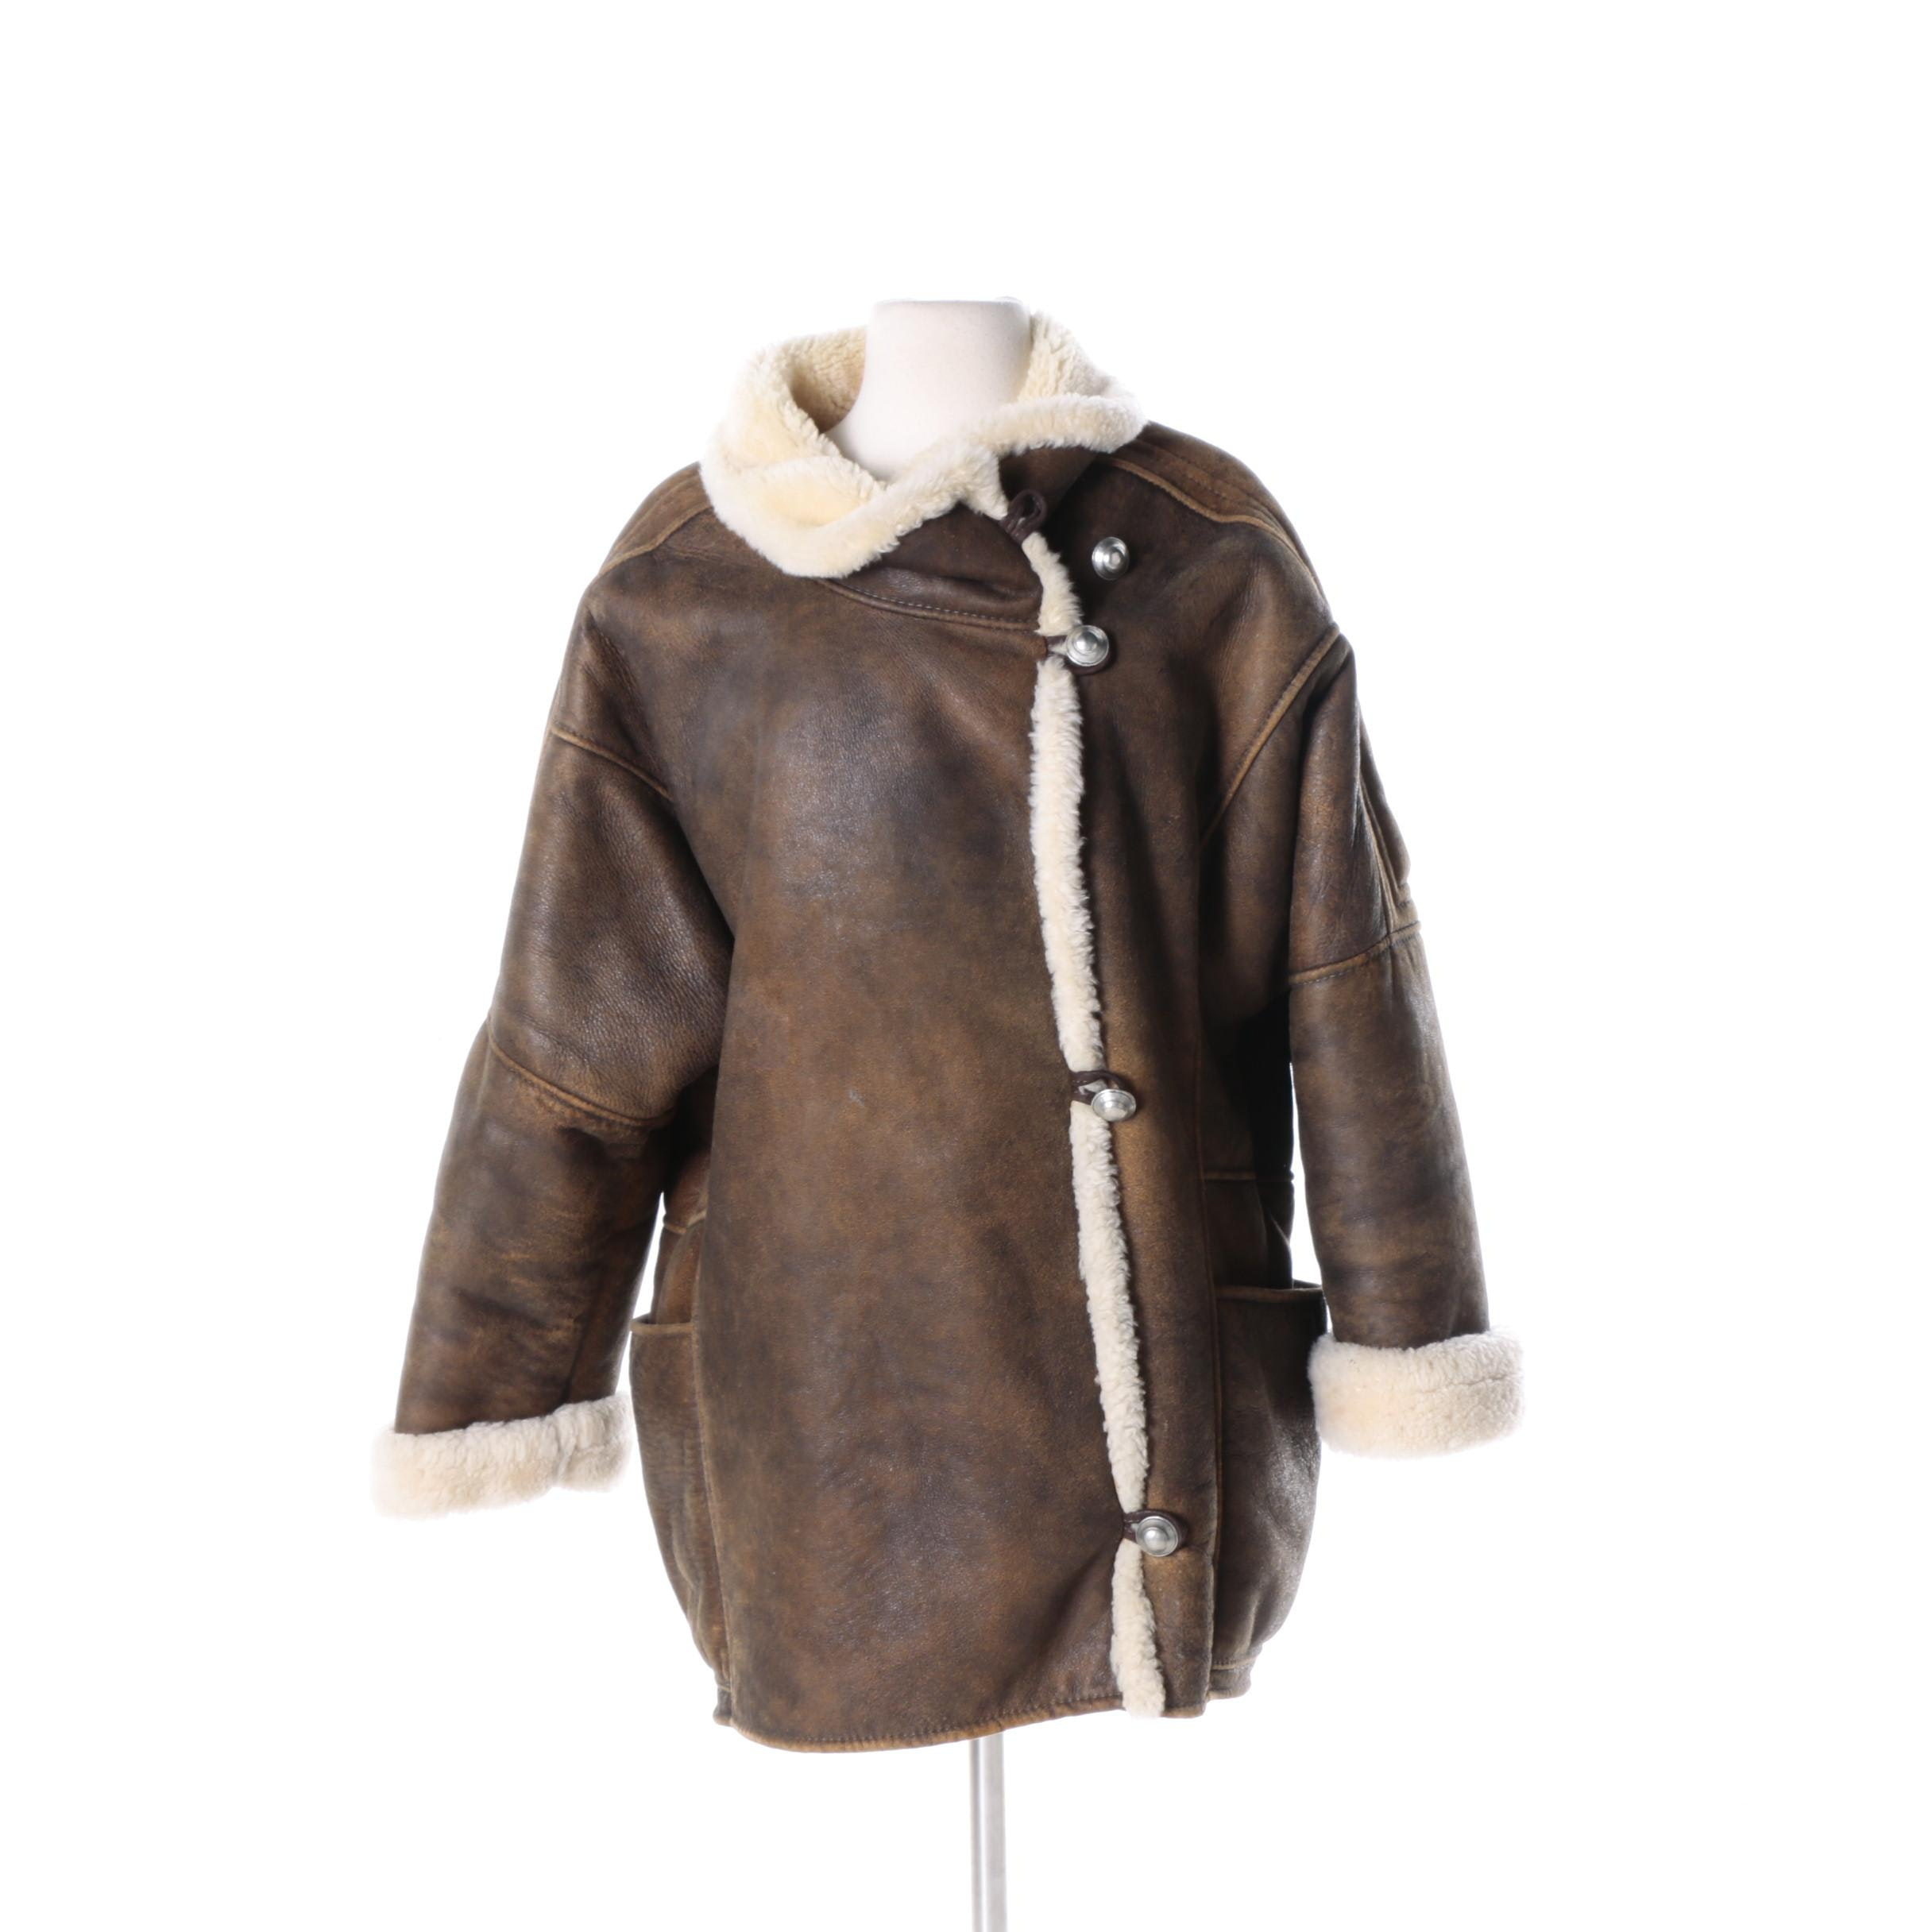 Women's Brown Leather Coat